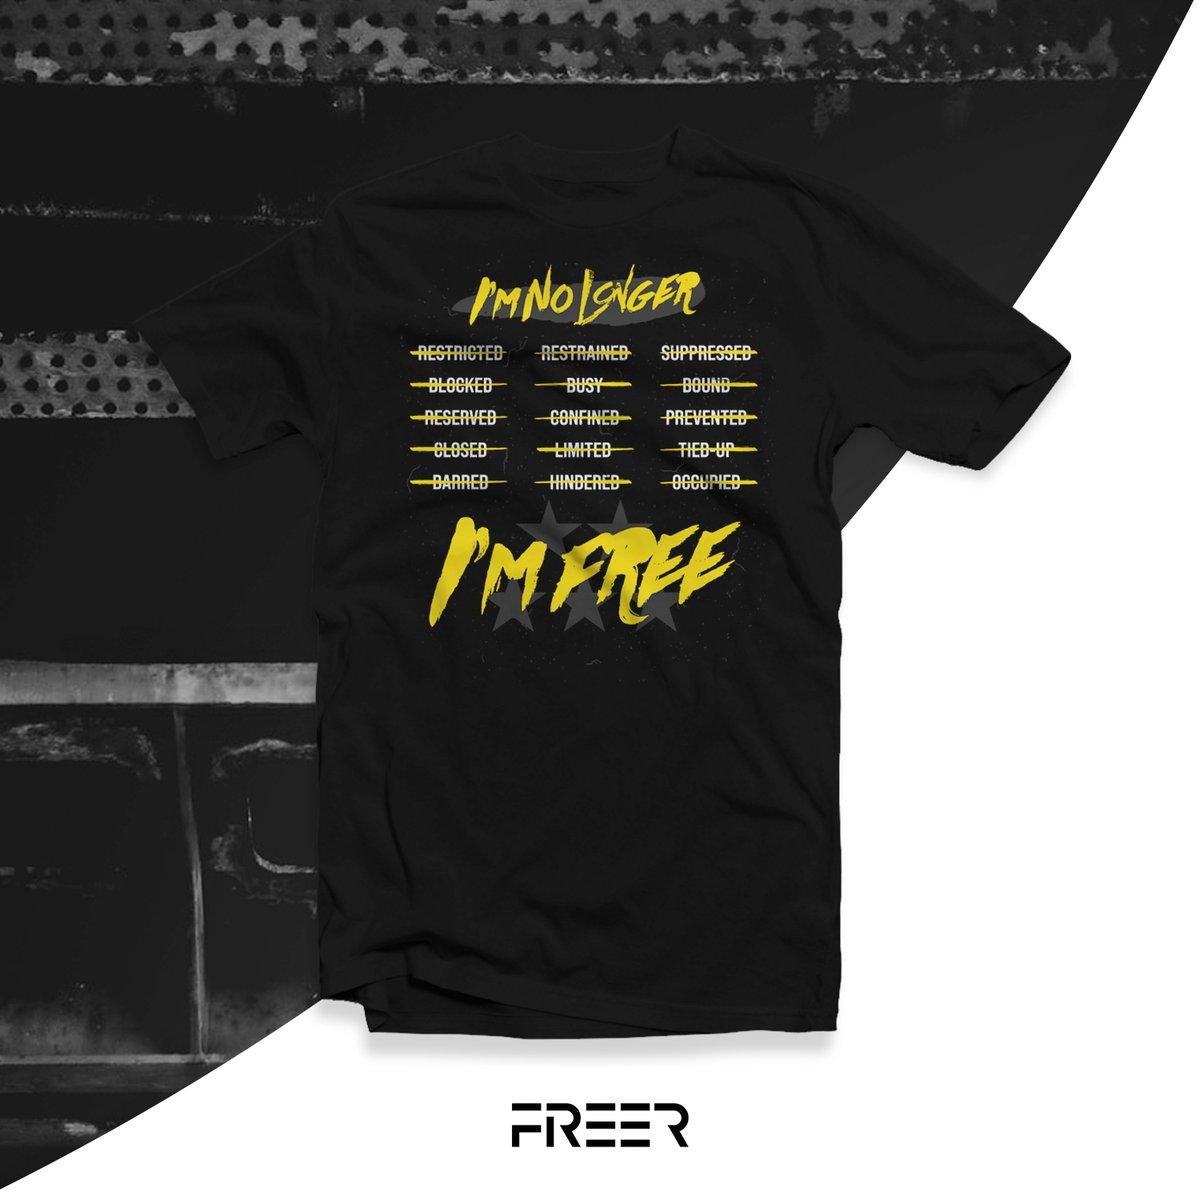 Shirt design for @freer.brand  #shirtdesign #printdesign #graphicdesign #print #vector #illustrator #merchdesign #teeshirts #printdesigns #shirtdesigner #shirtdesigns #ClothingLines #streetwearclothing #freeyourself https://t.co/JfUCMZ0D9a